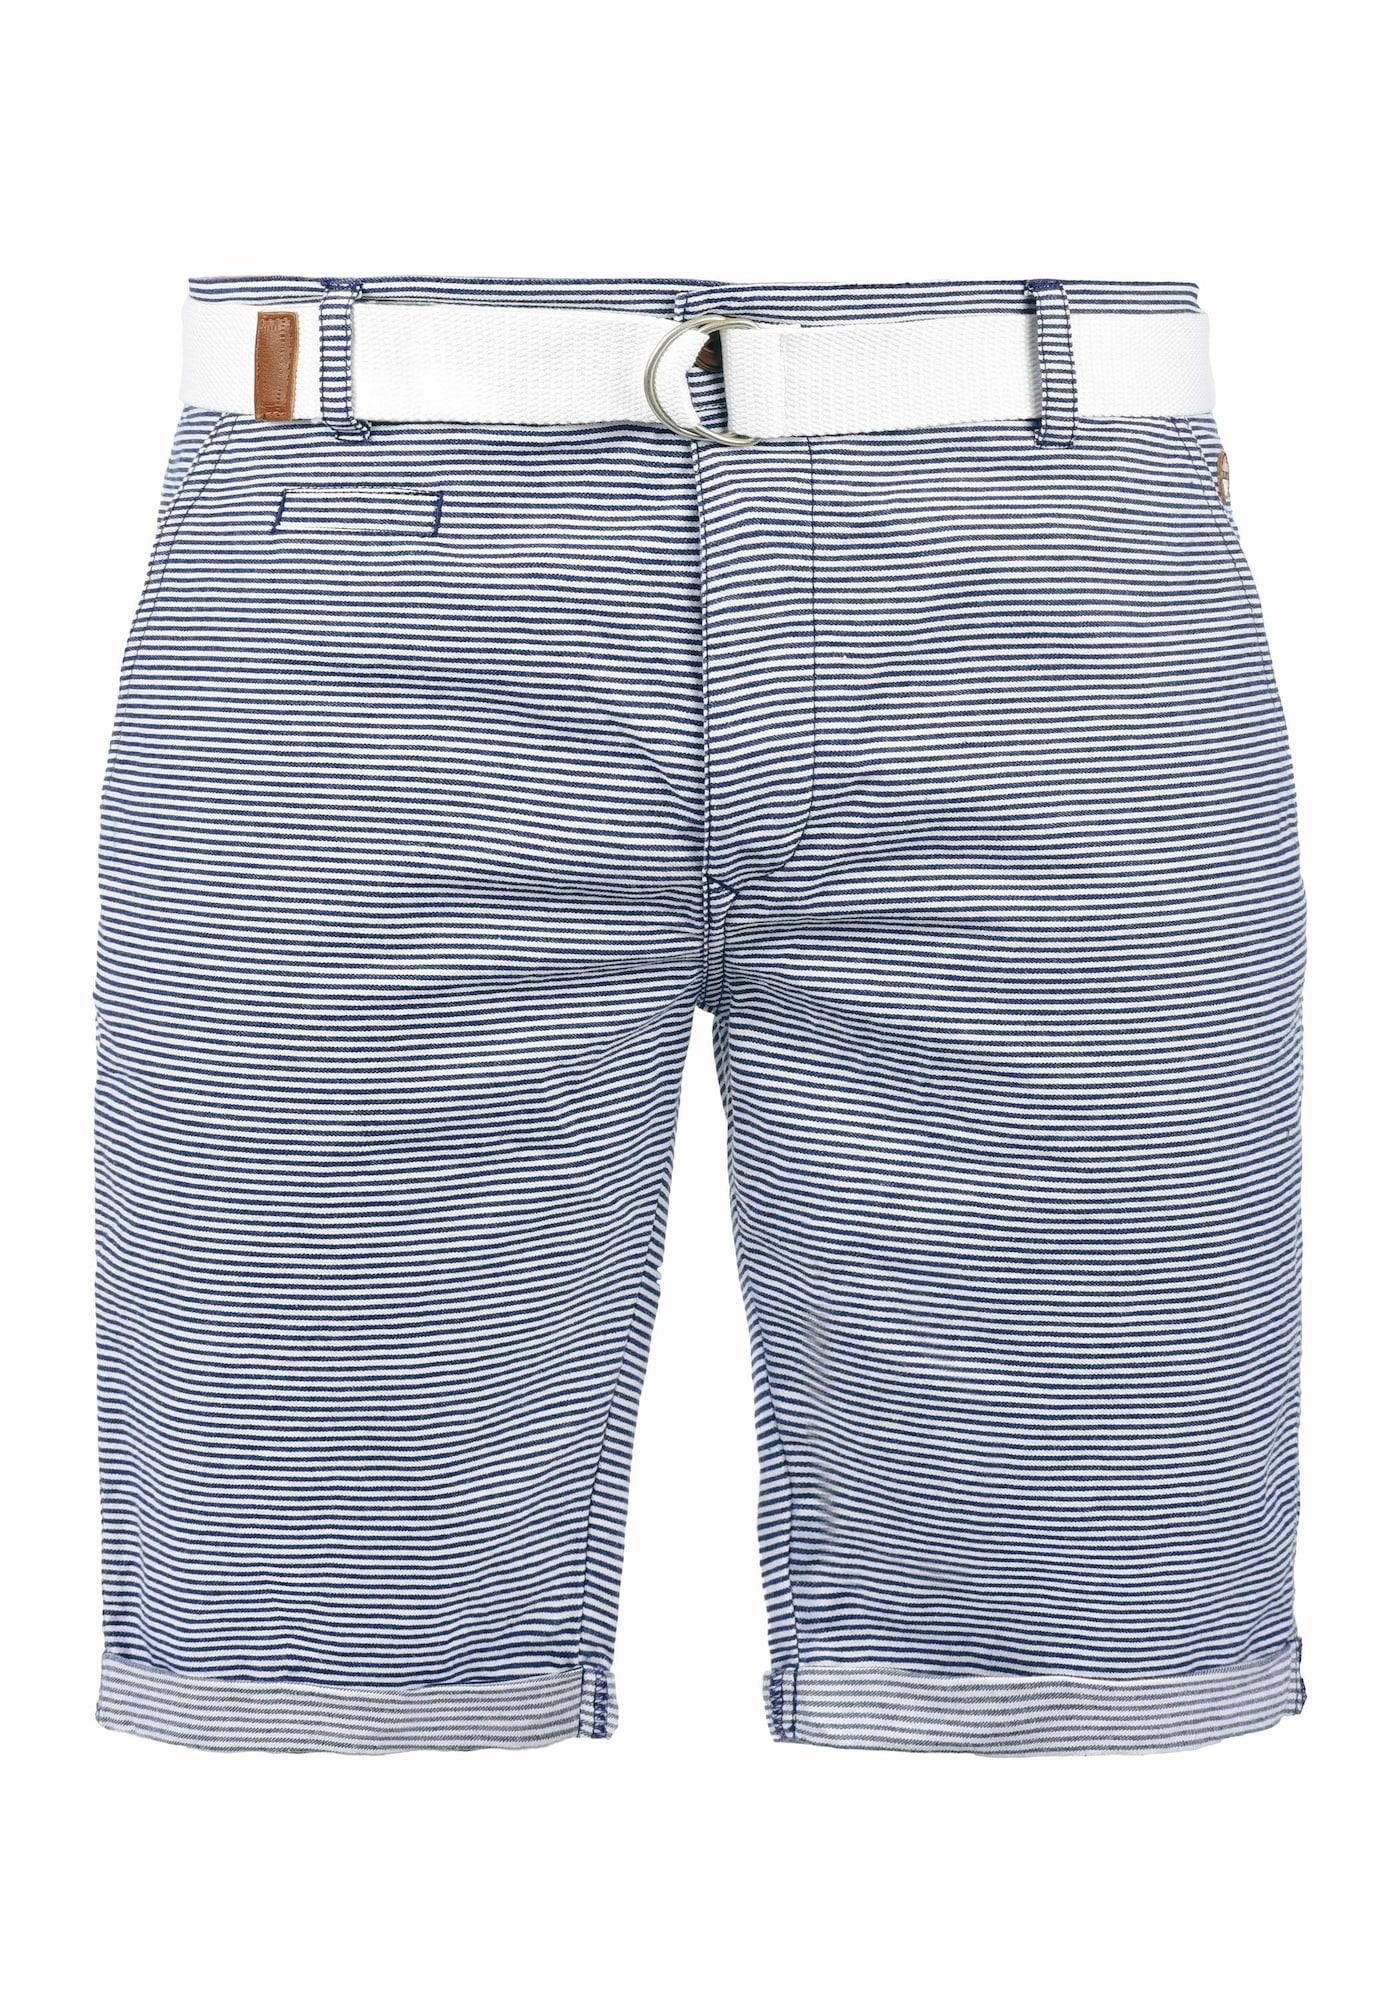 Chinoshorts 'Quantigo'   Bekleidung > Shorts & Bermudas > Shorts   Blau   Blend